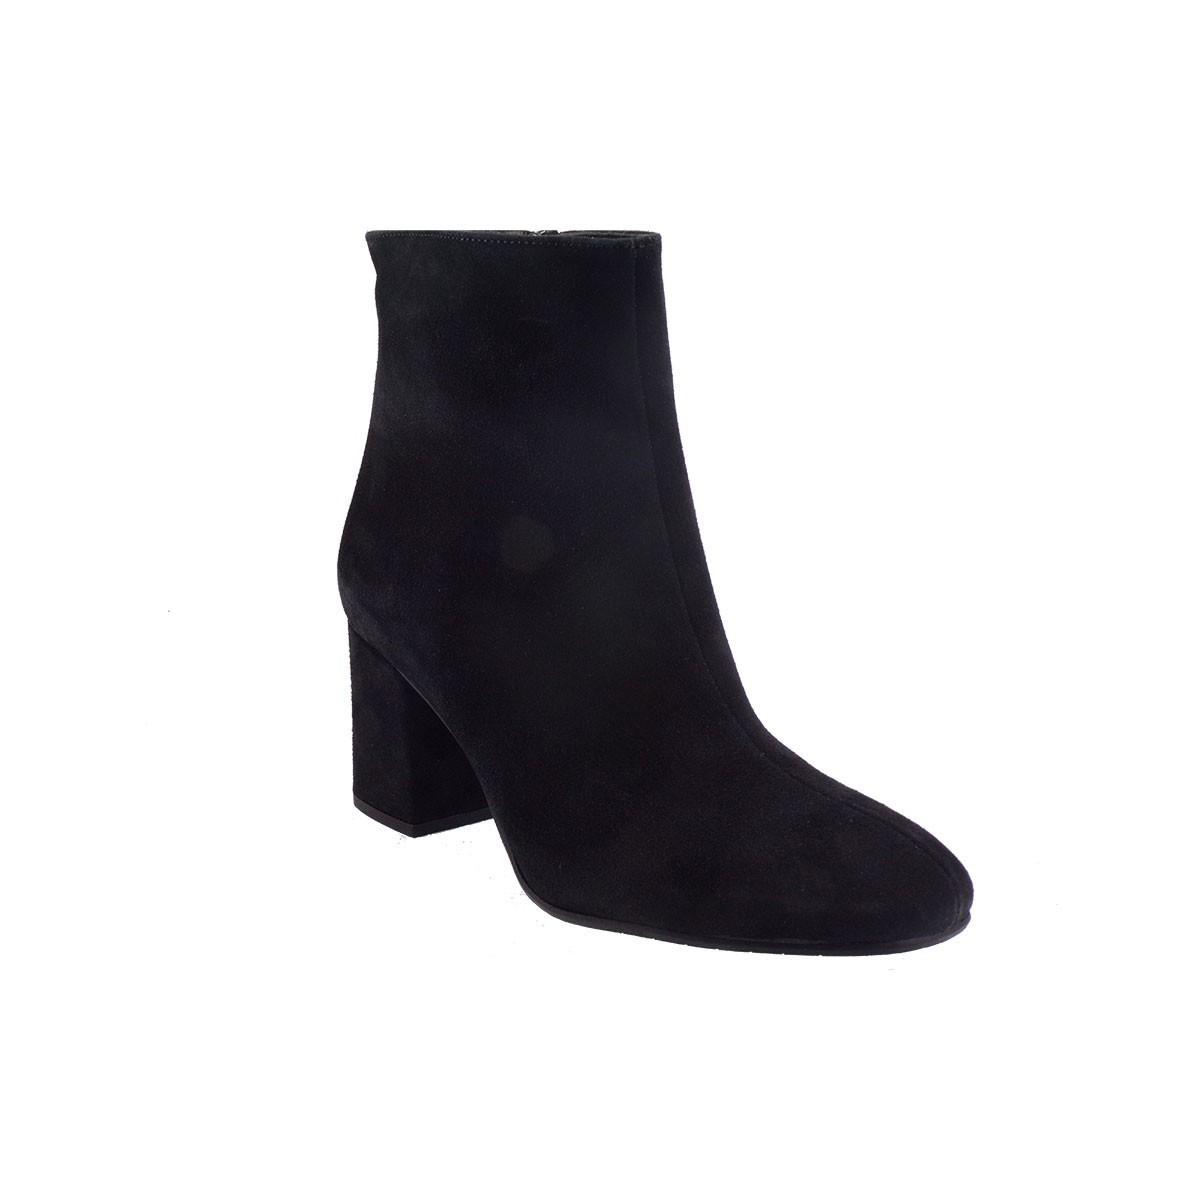 Moods Shoes Γυναικεία Μποτάκια 3060 Μαύρο Καστόρι